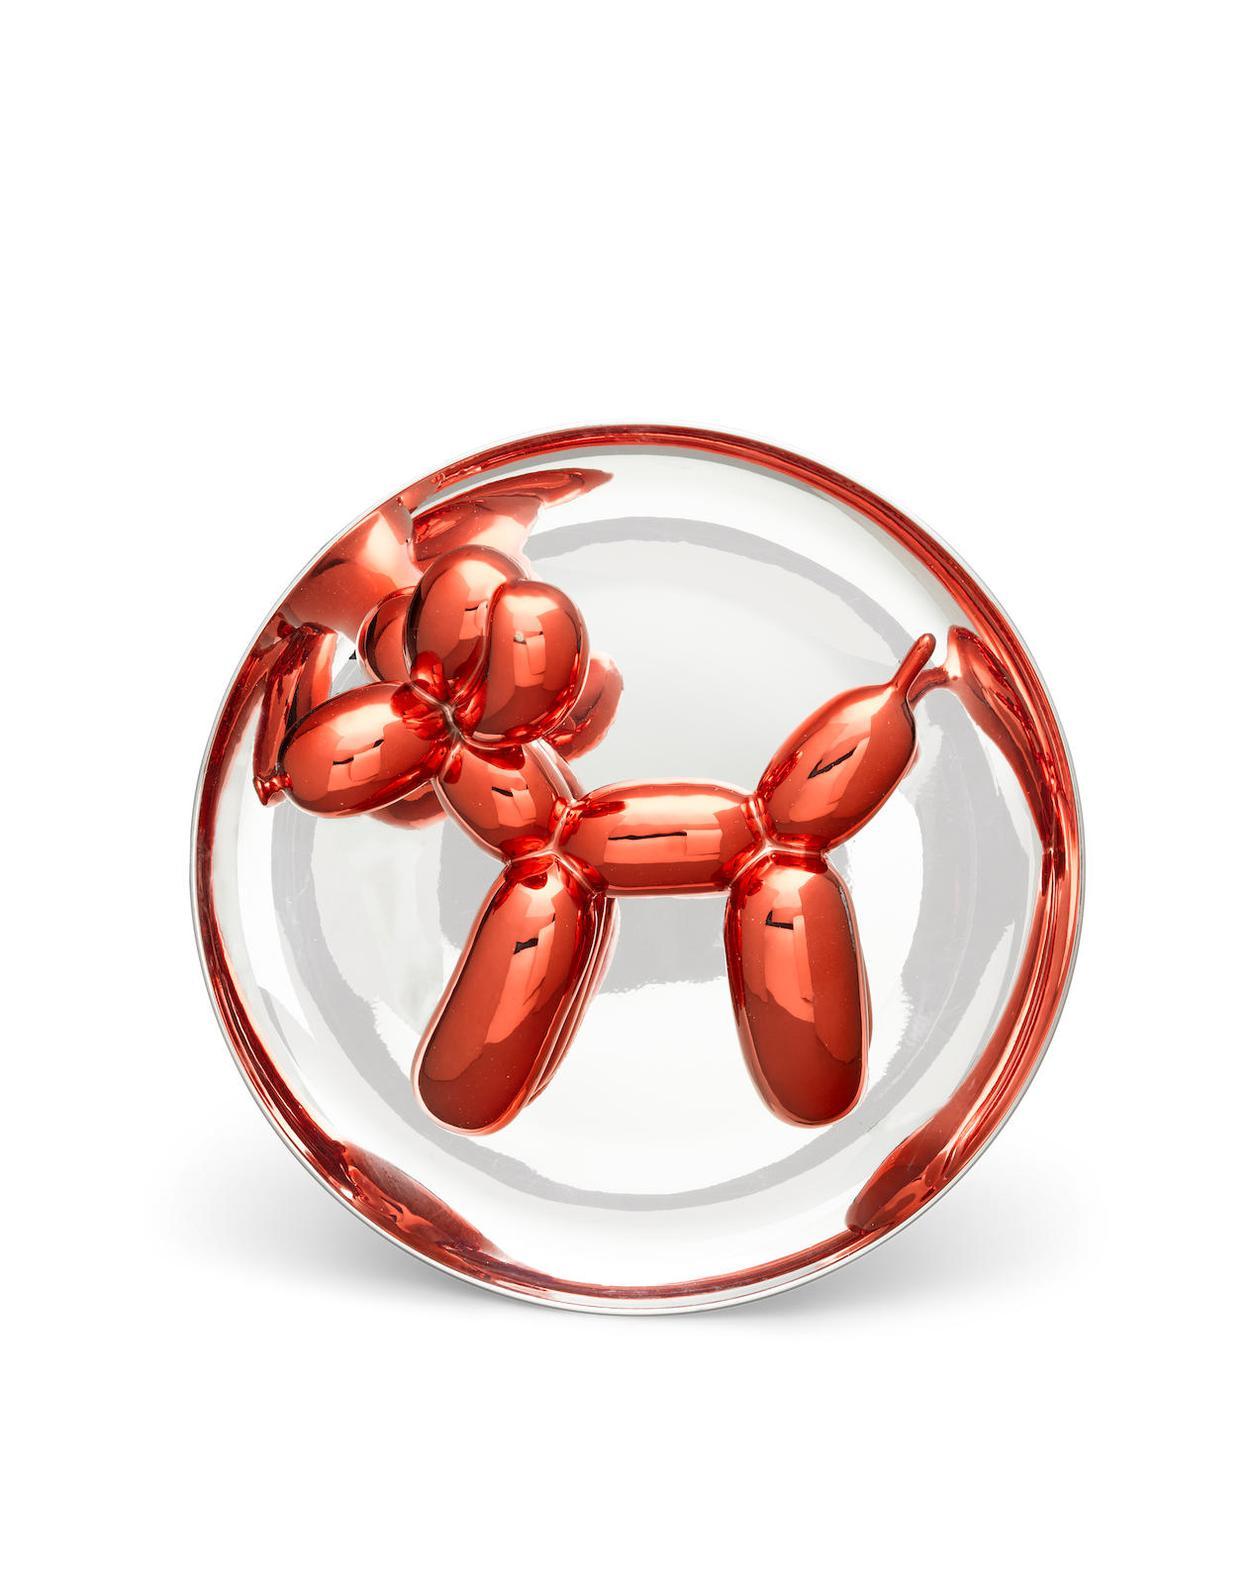 Jeff Koons-Balloon Dog-Red-1995